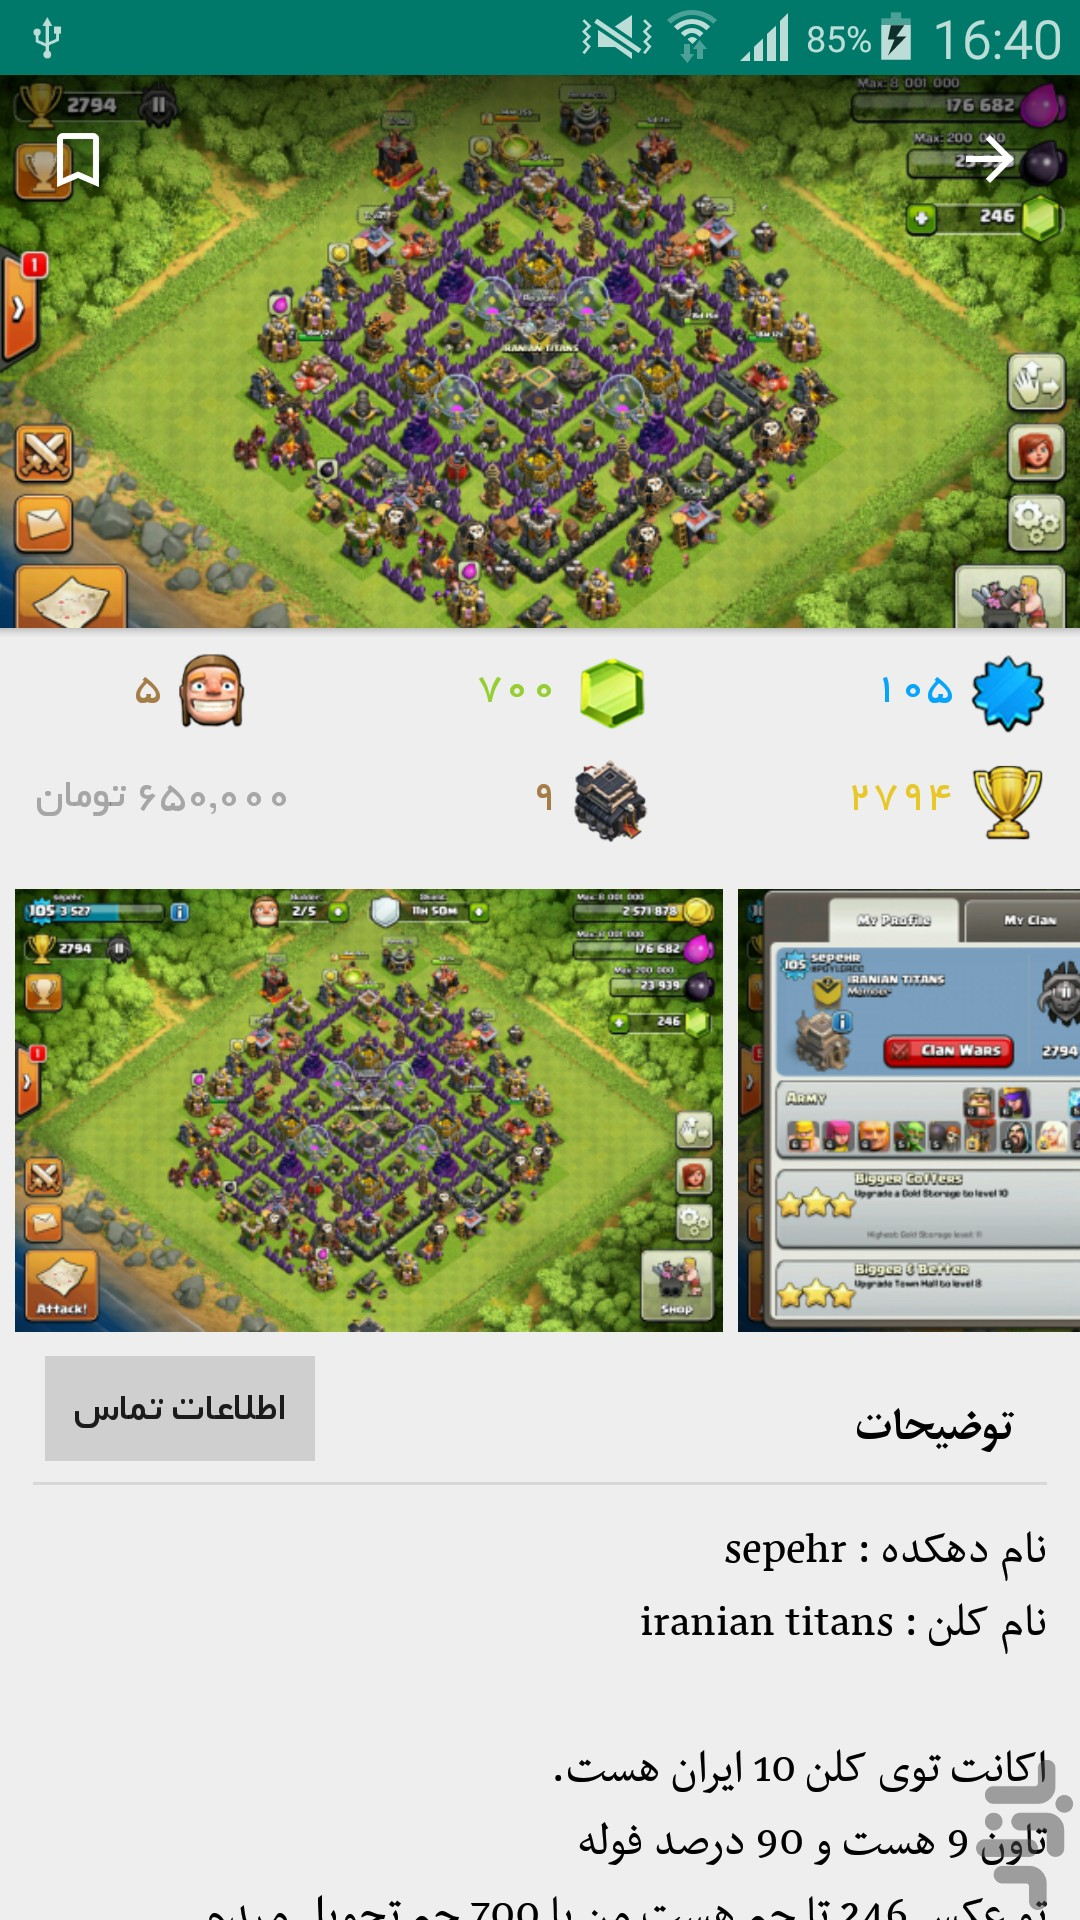 کلش استور جدید (خرید فروش کلش) screenshot